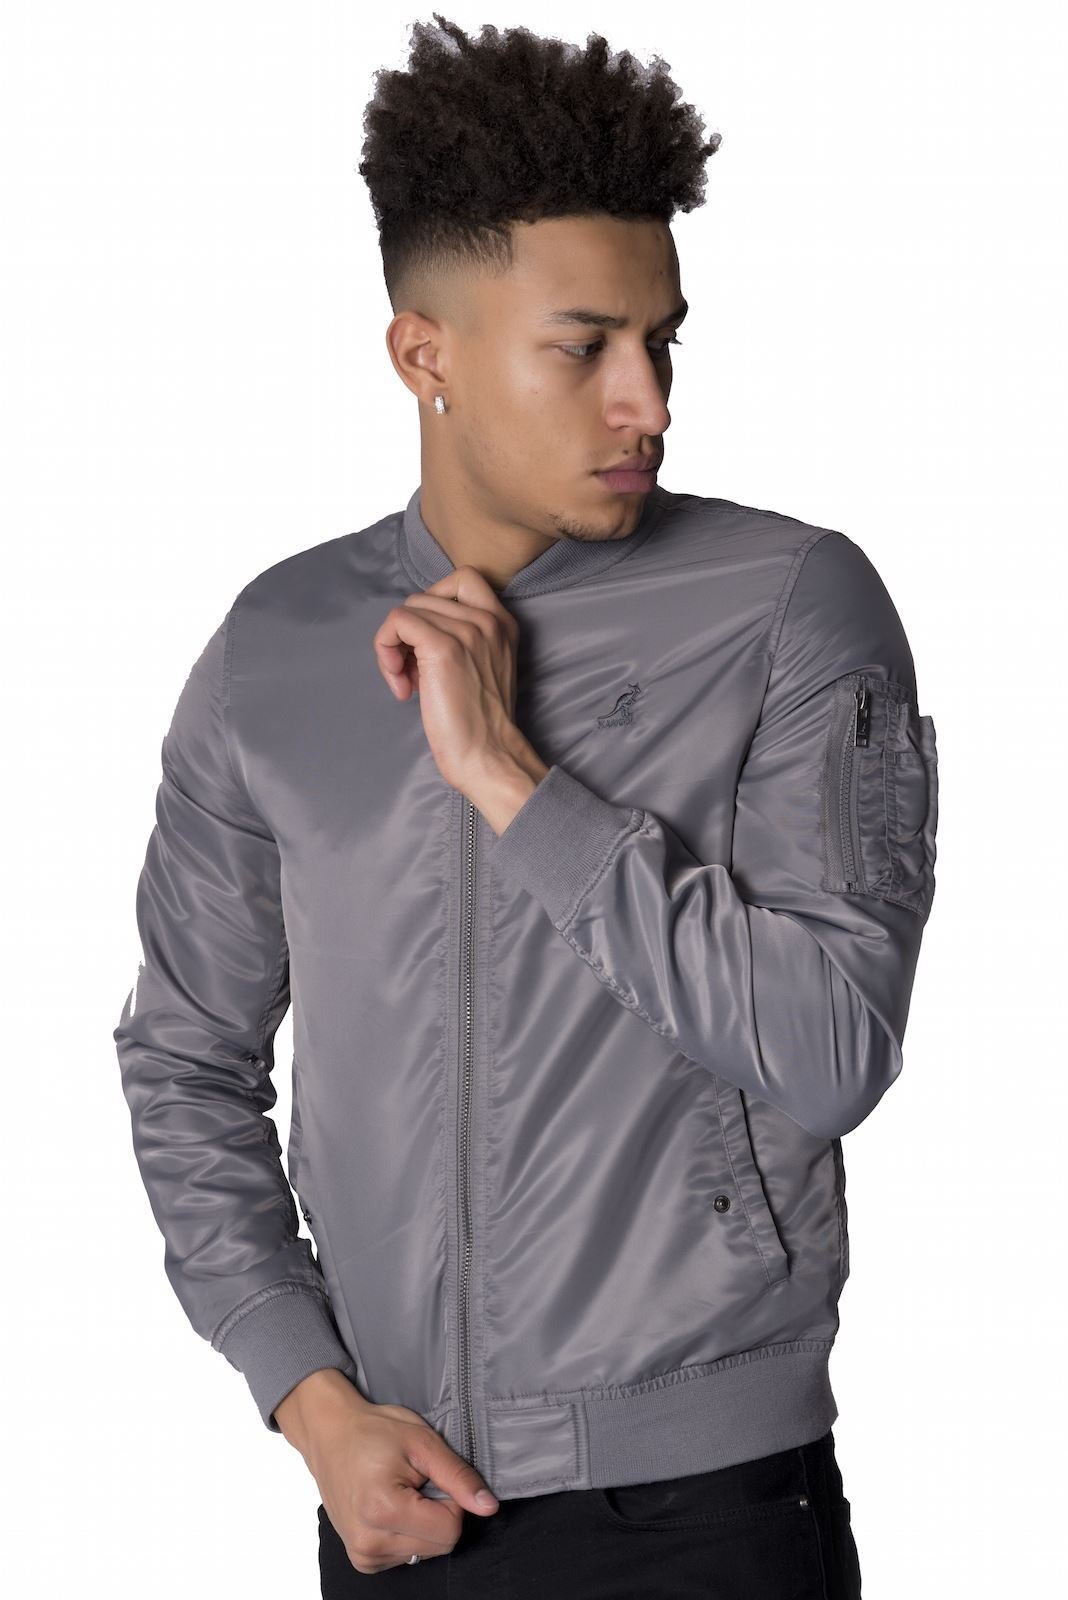 Mens khaki jacket casual - Kangol Designer Mens Ma1 Bomber Jacket Casual Zip